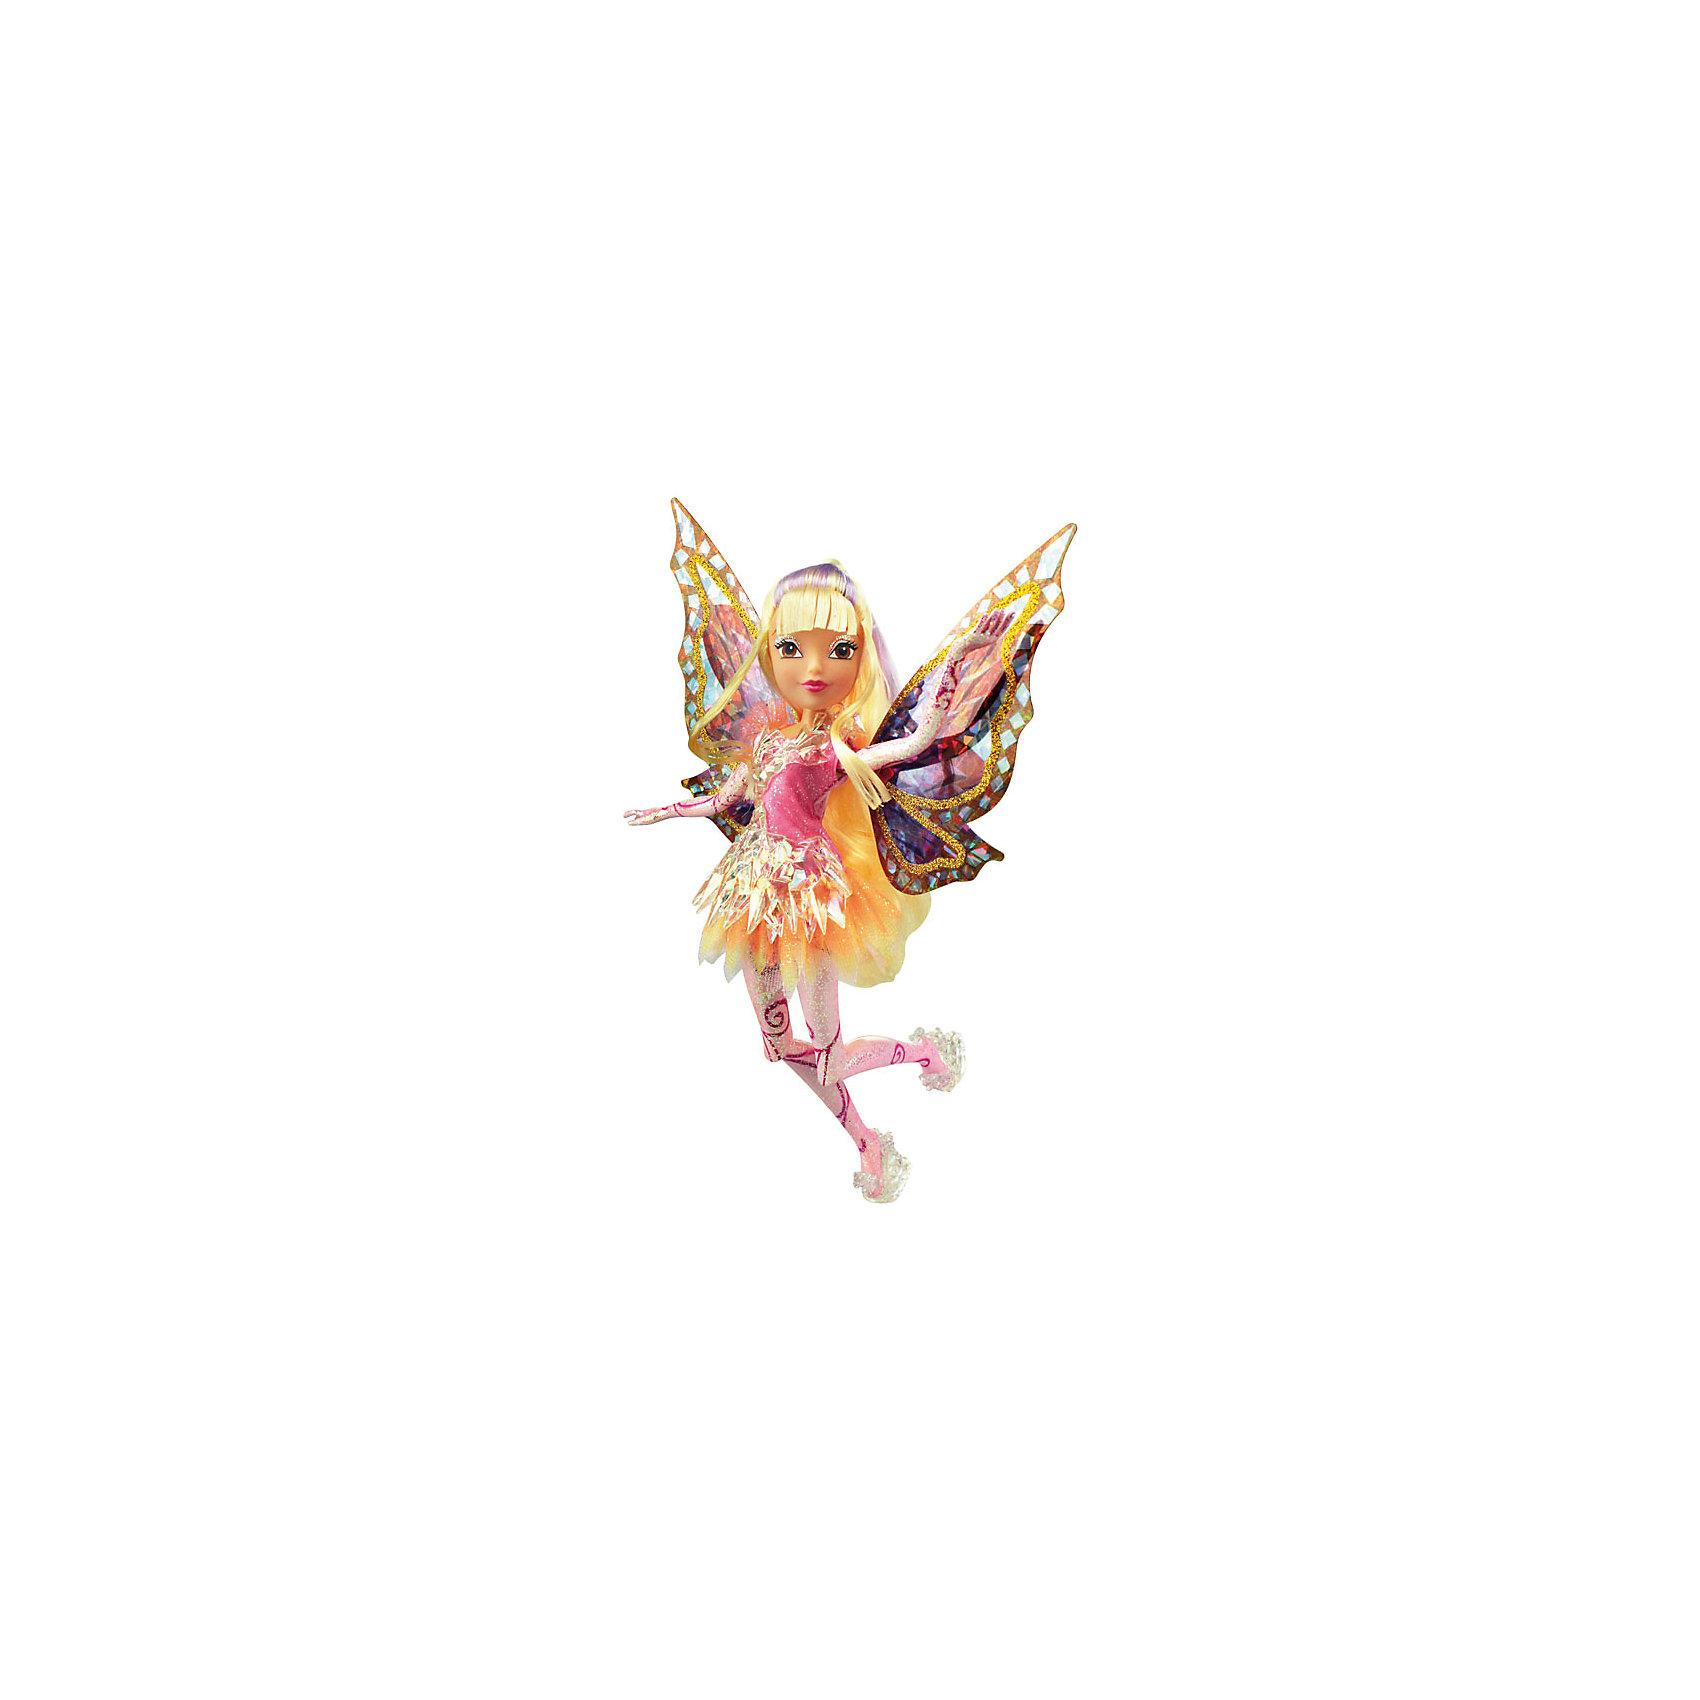 Gulliver Кукла Стелла, Тайникс, Winx Club gulliver игровой набор блум волшебный трон winx club